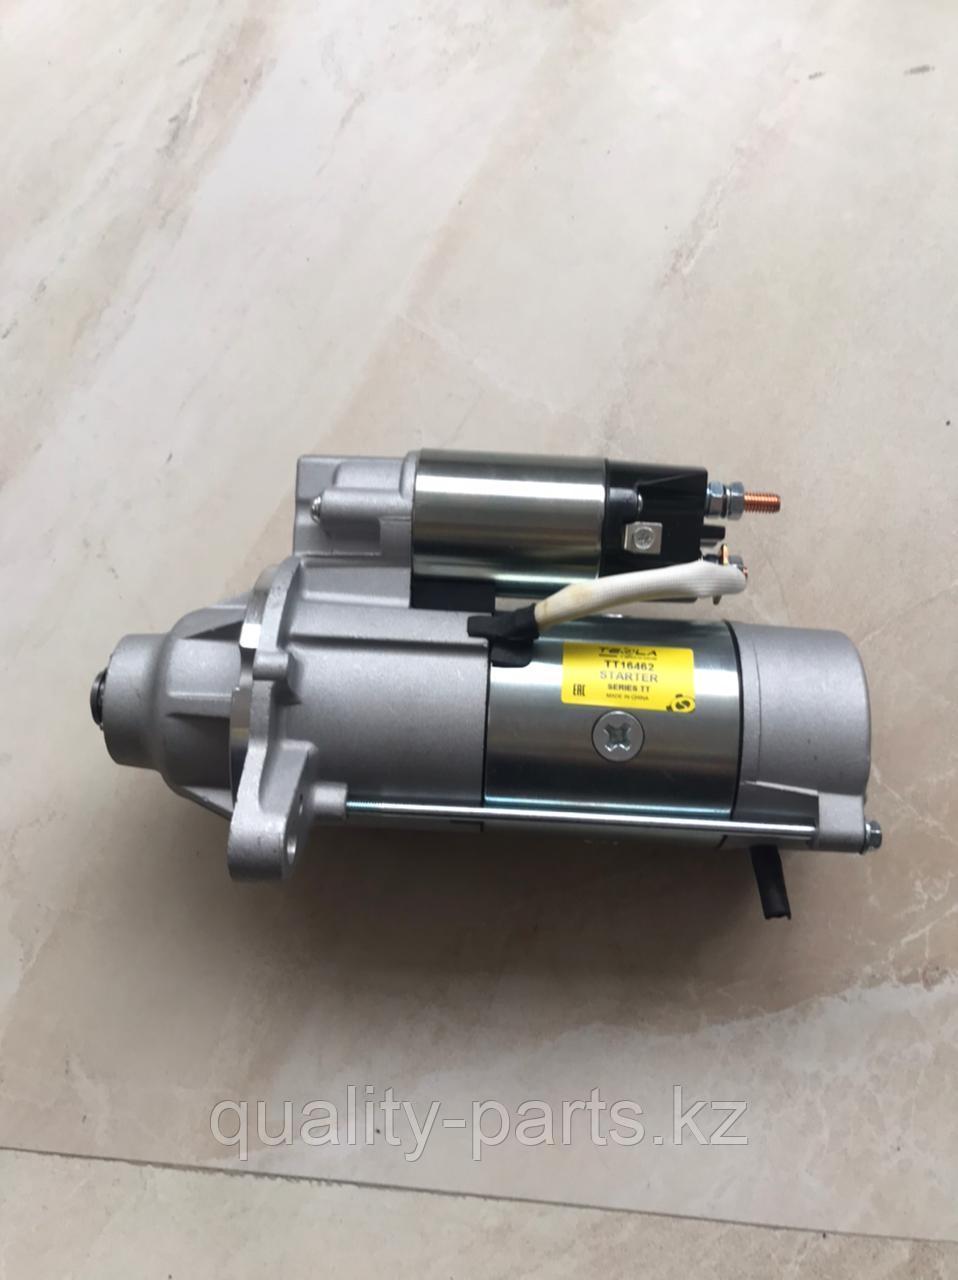 Стартер для экскаватора Hyundai R305LC-7.